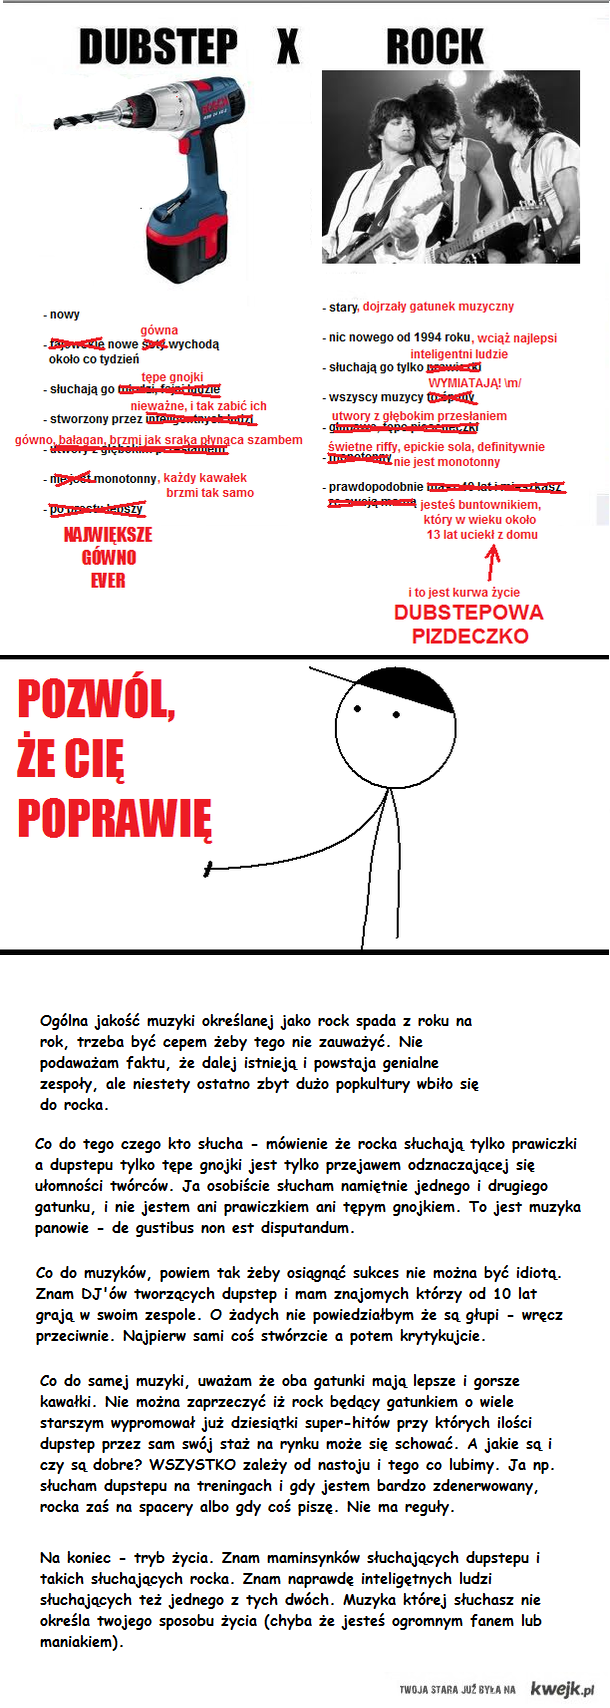 Rock i Dupstep cz3